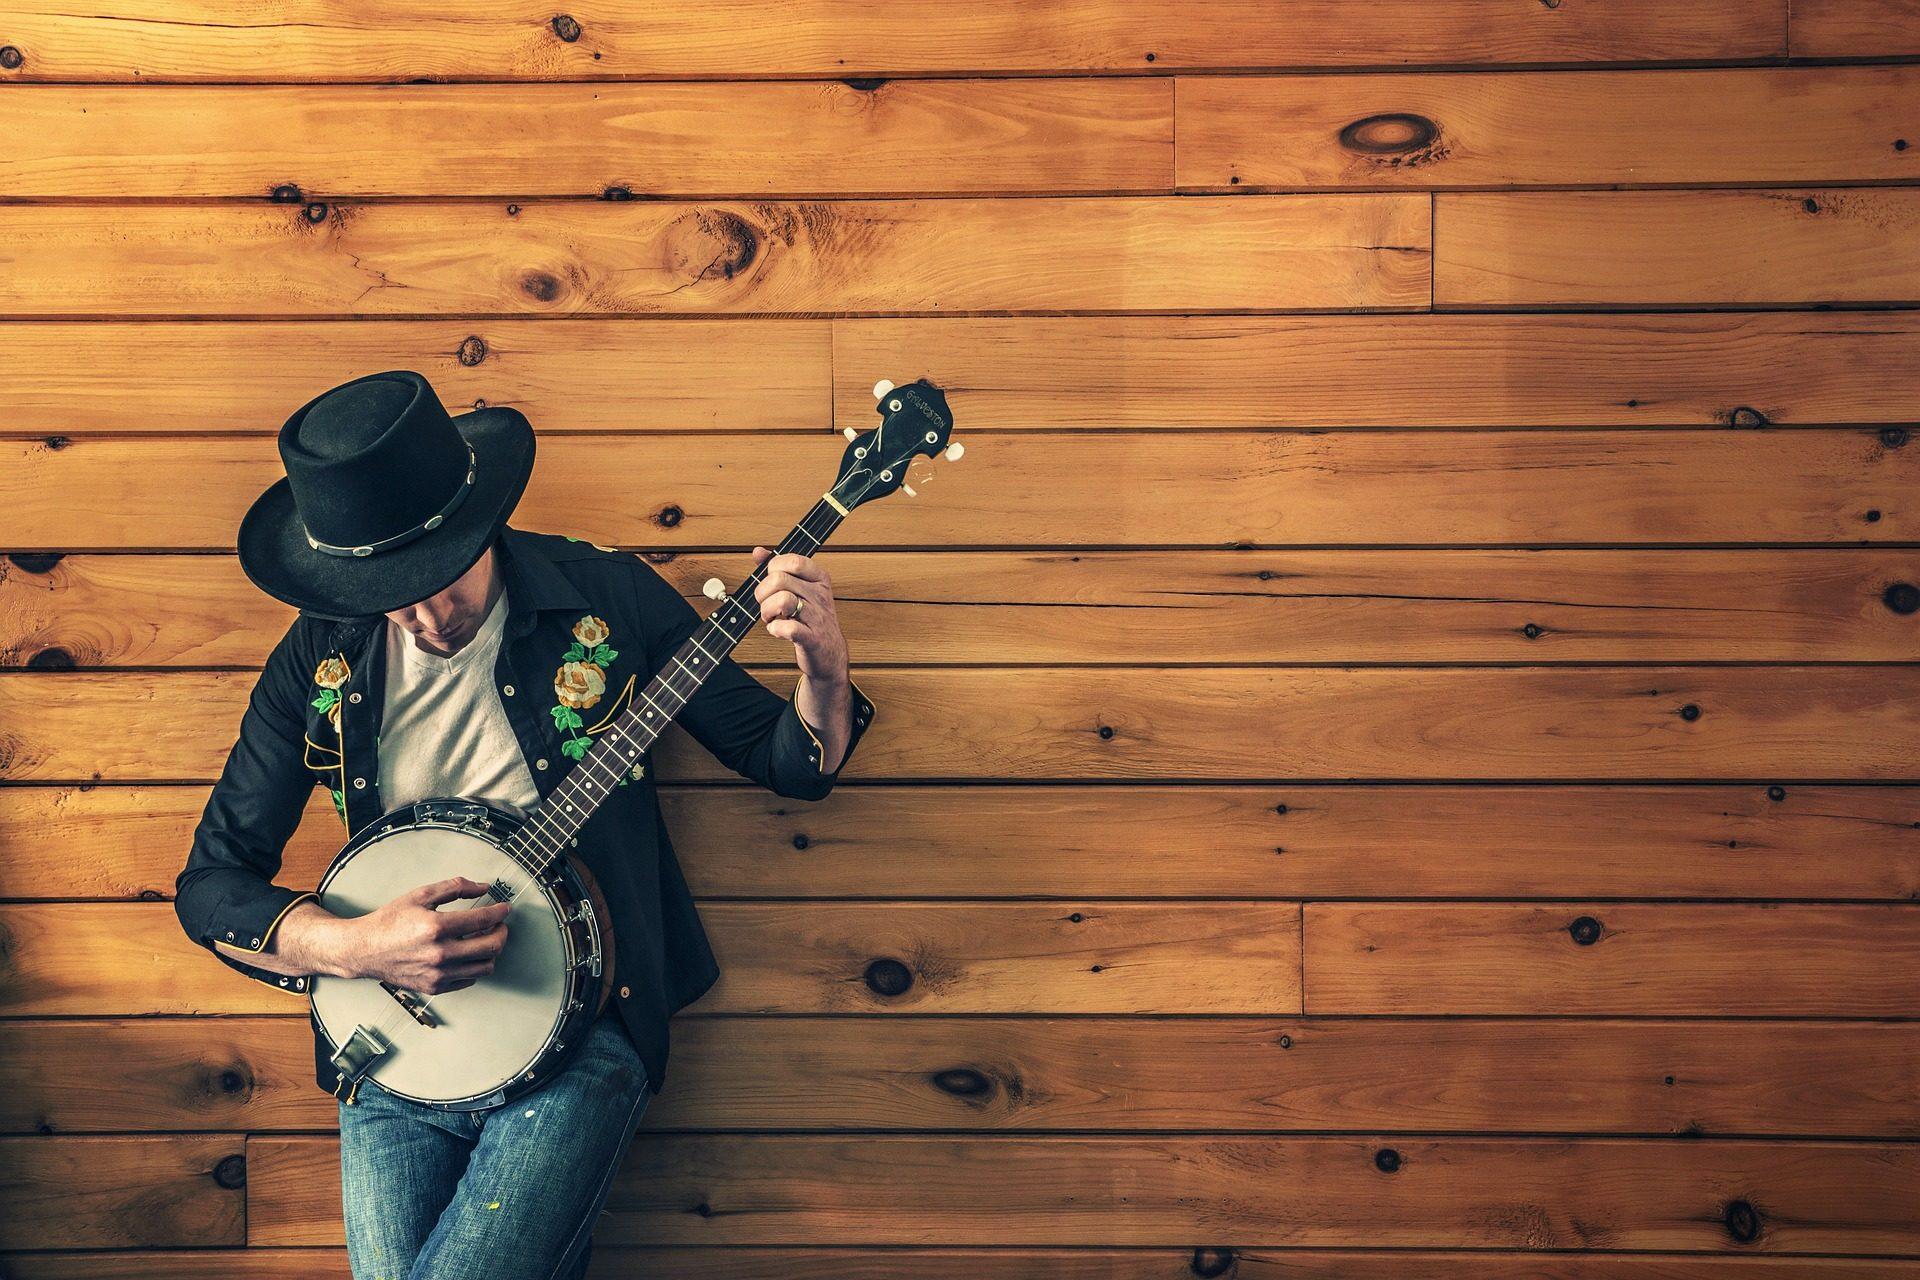 músico, banjo, Guitarra, Chapéu, país - Papéis de parede HD - Professor-falken.com